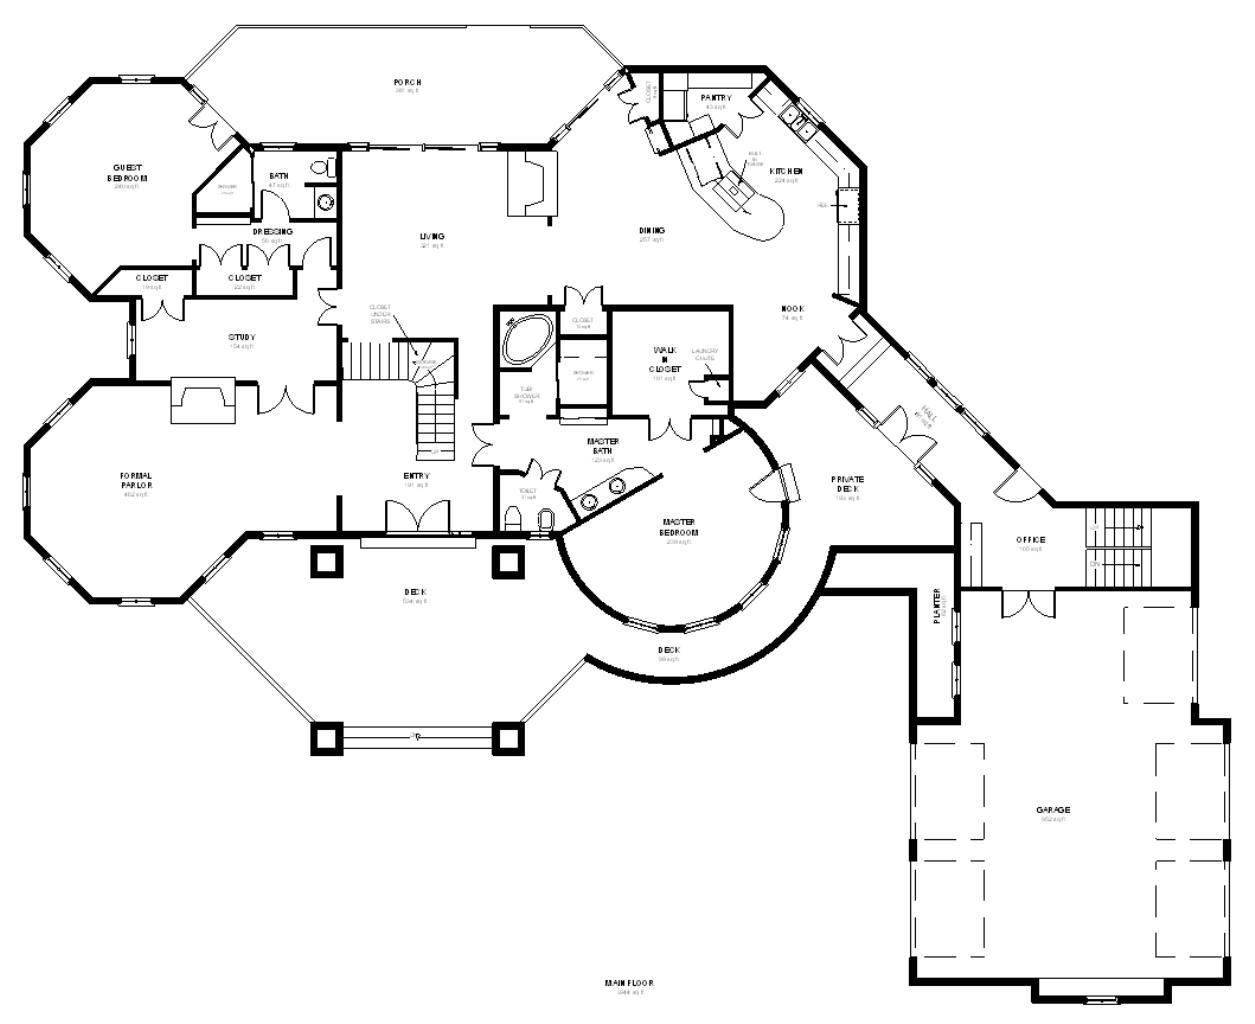 Octagon House Plans amazing octagon house floor plans 1h6x | mój wymarzony dom